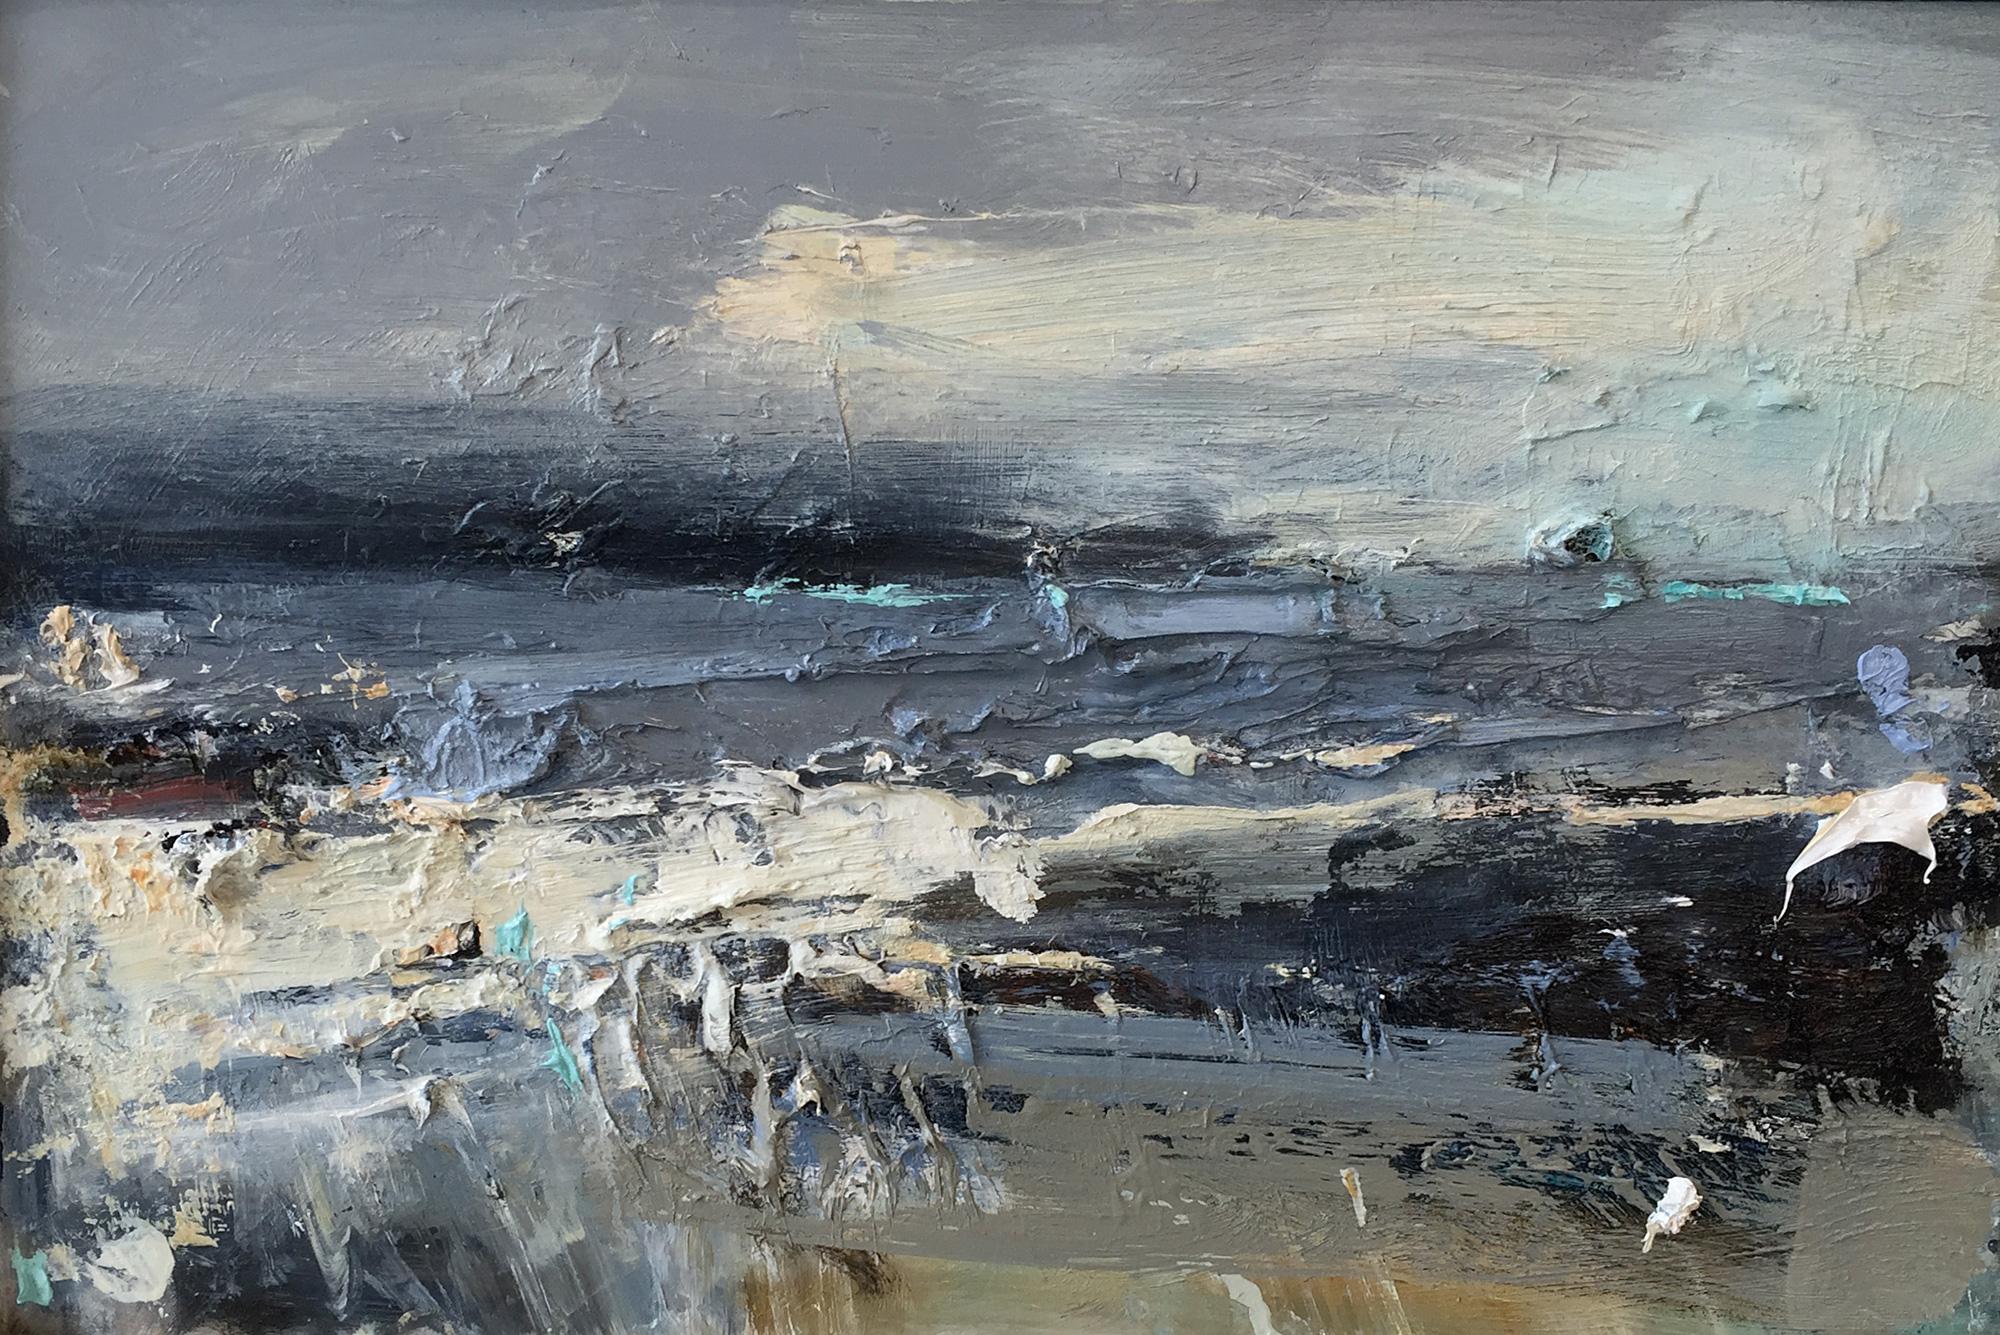 Winter Greys,Sennen.  Oil on board. 20 x 30cm  Sold